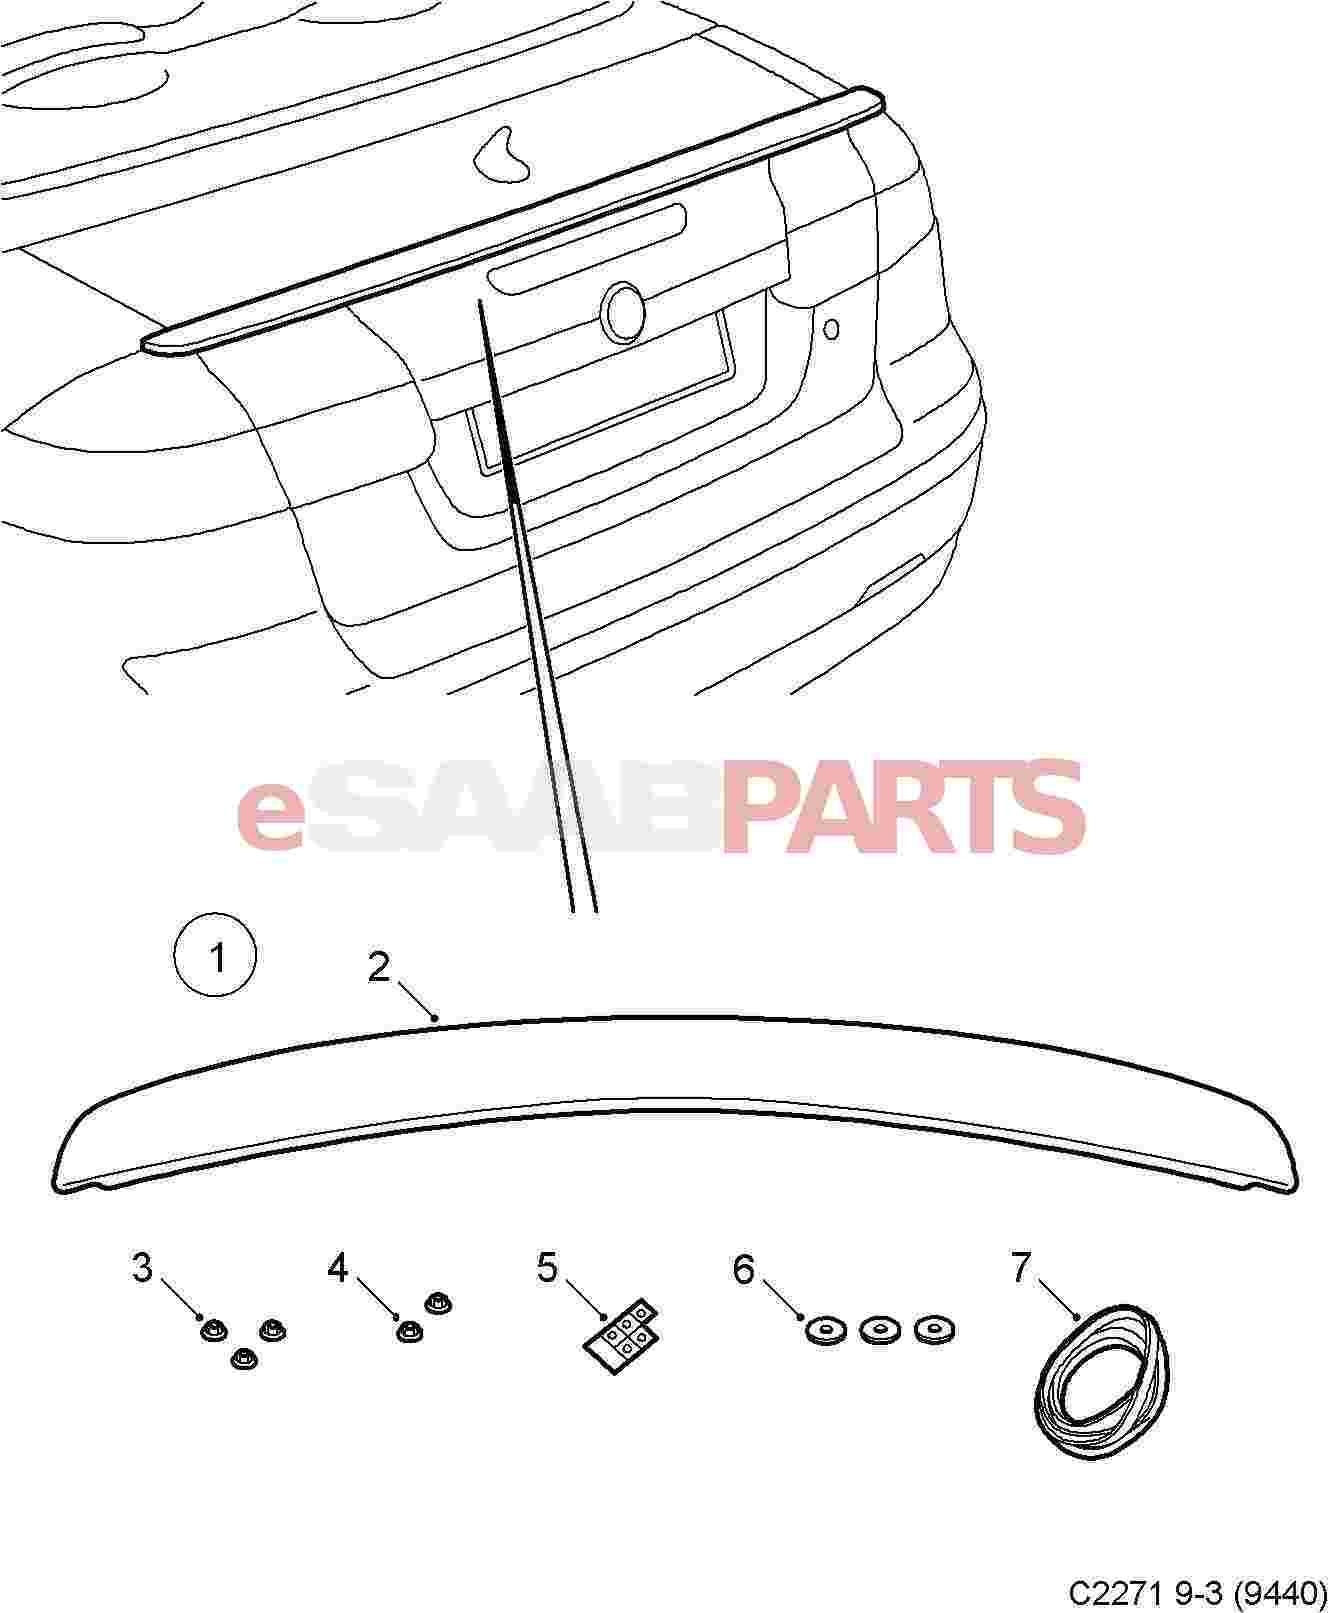 [12848386] SAAB Rear Trunk Spoiler for Saab 9-3 Aero